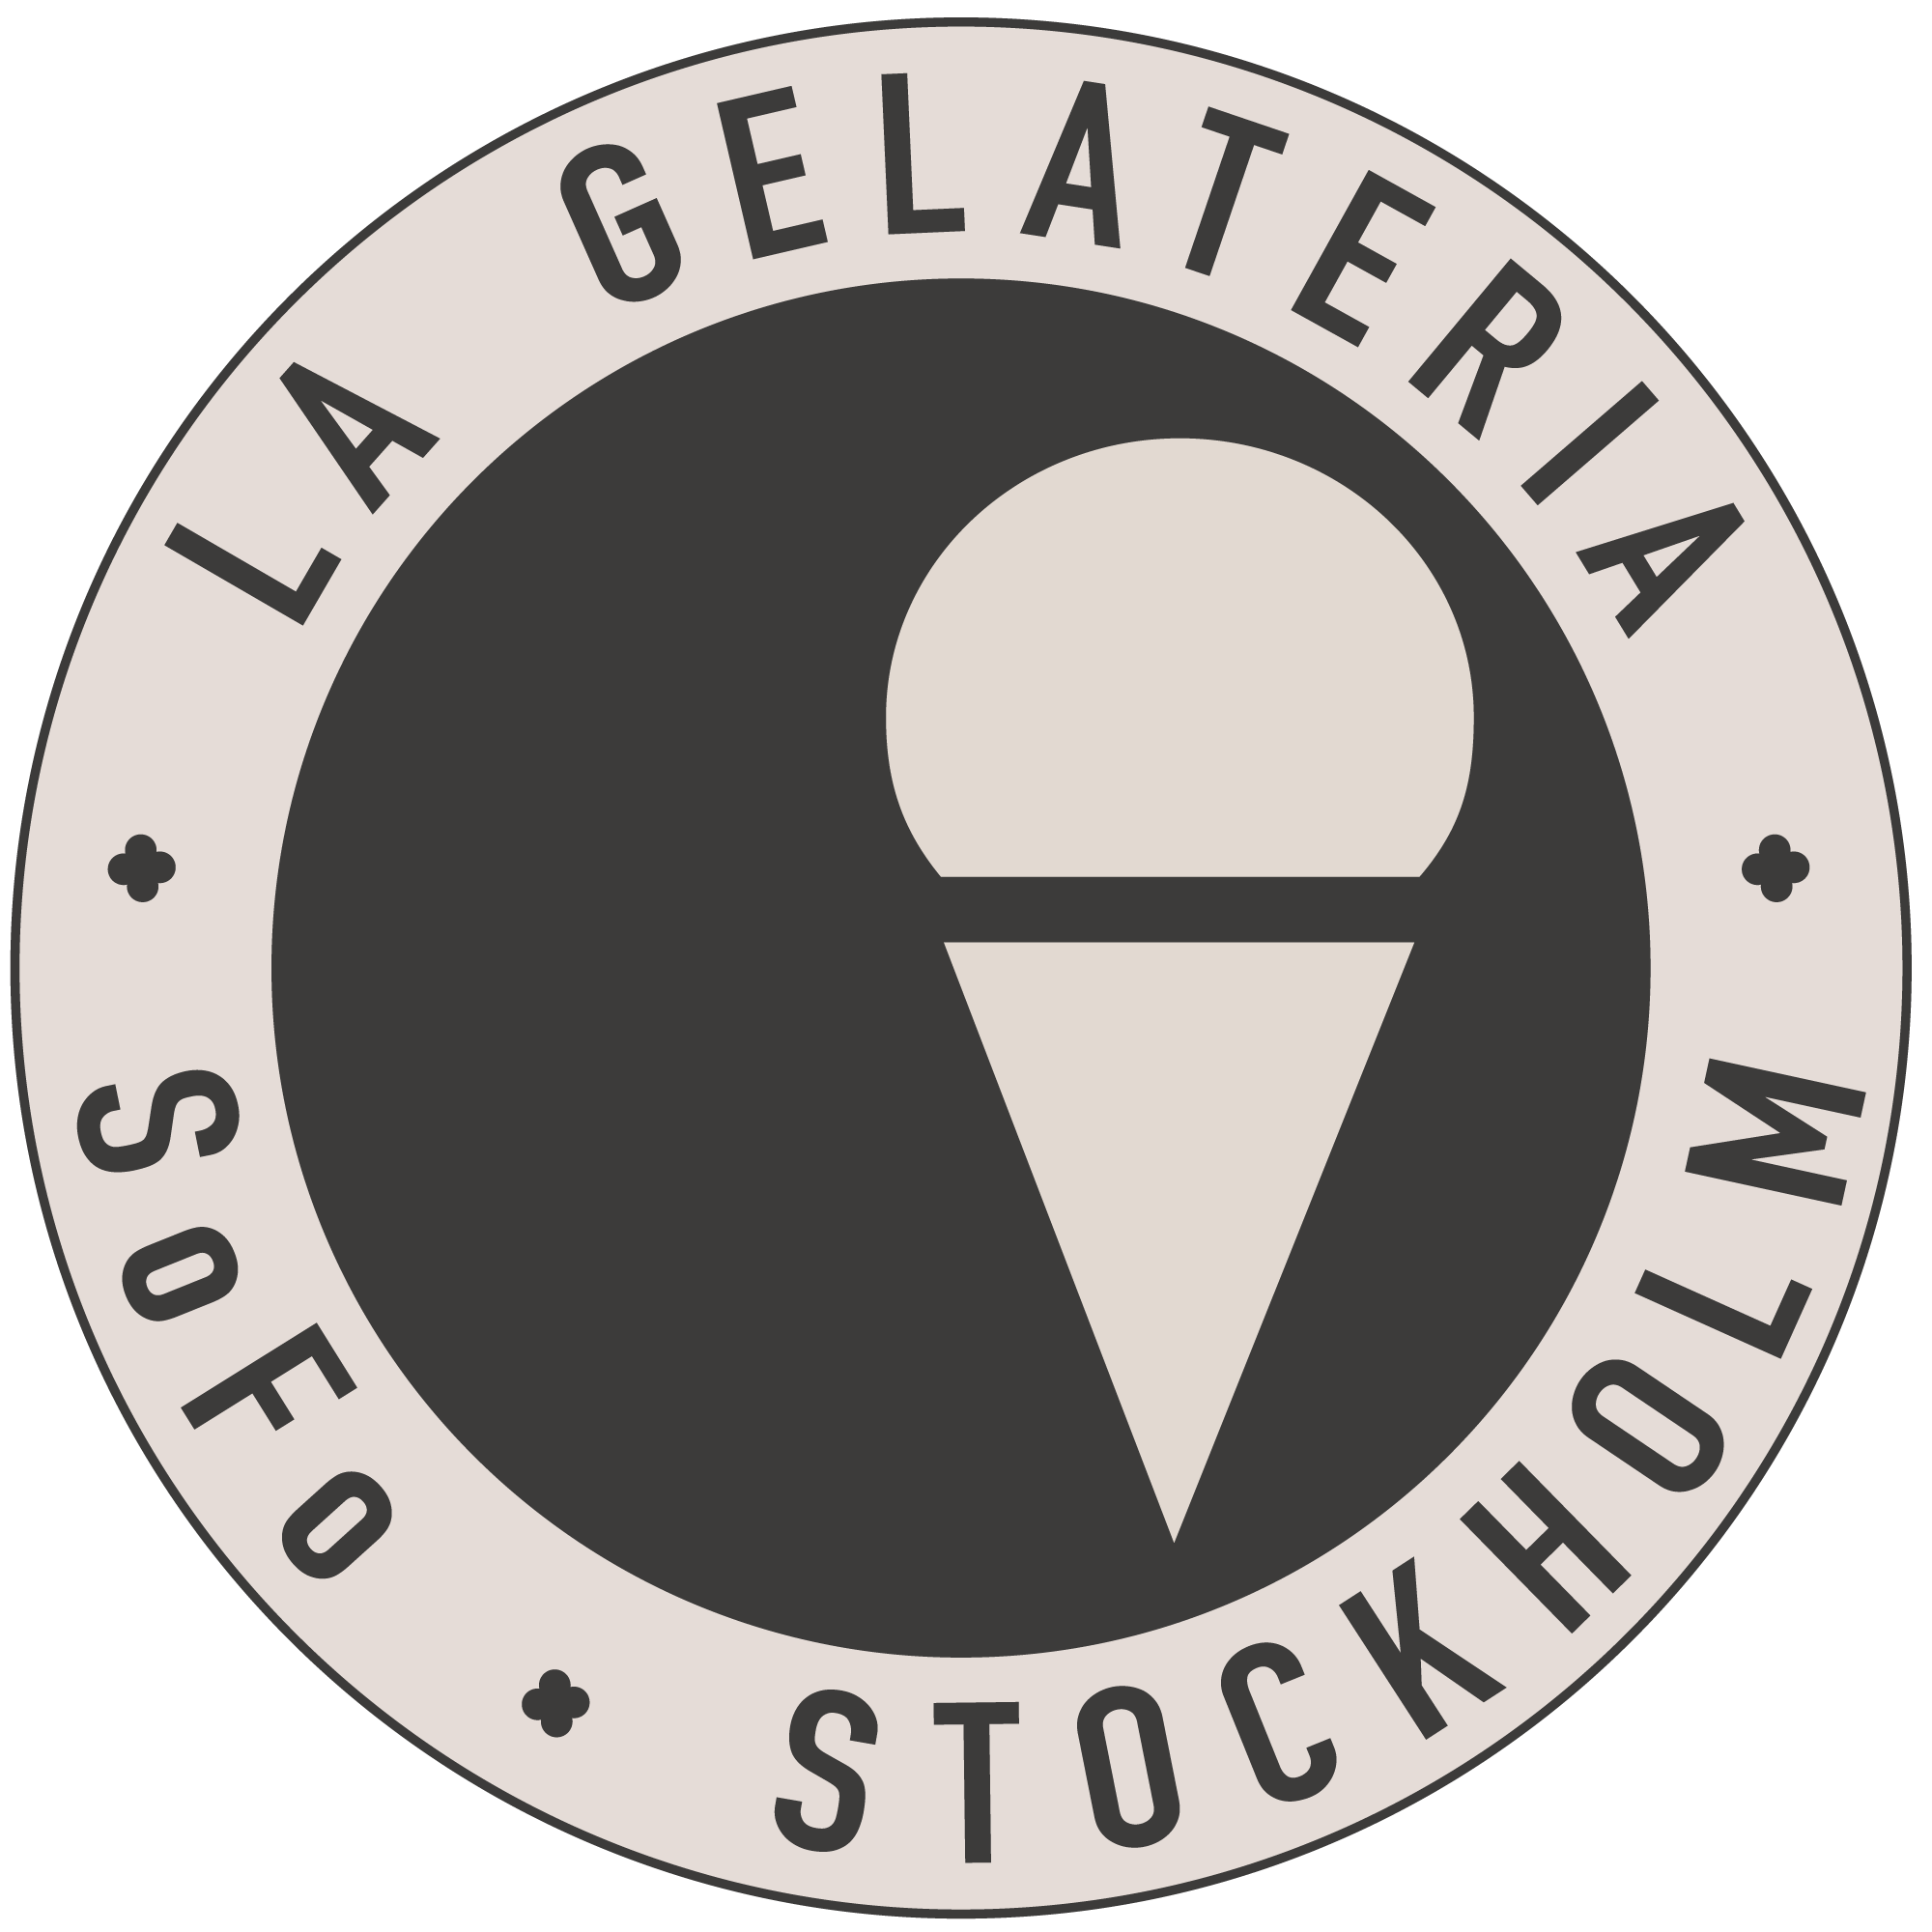 La Gelateria logo